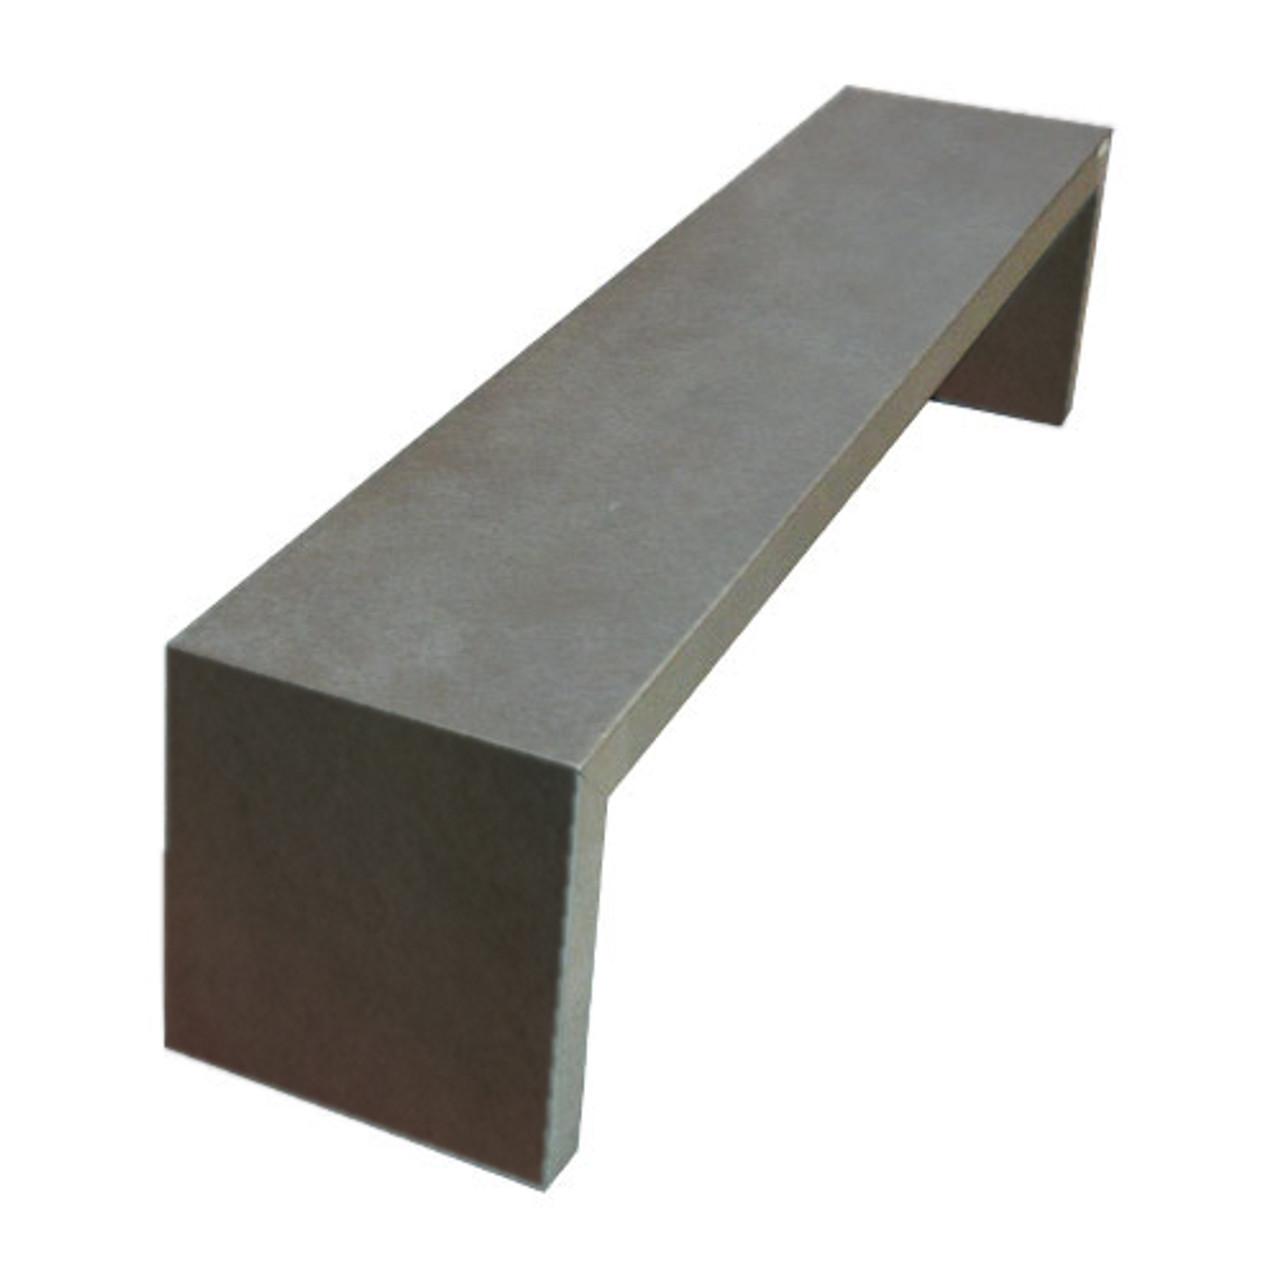 Cemento 2M Bench